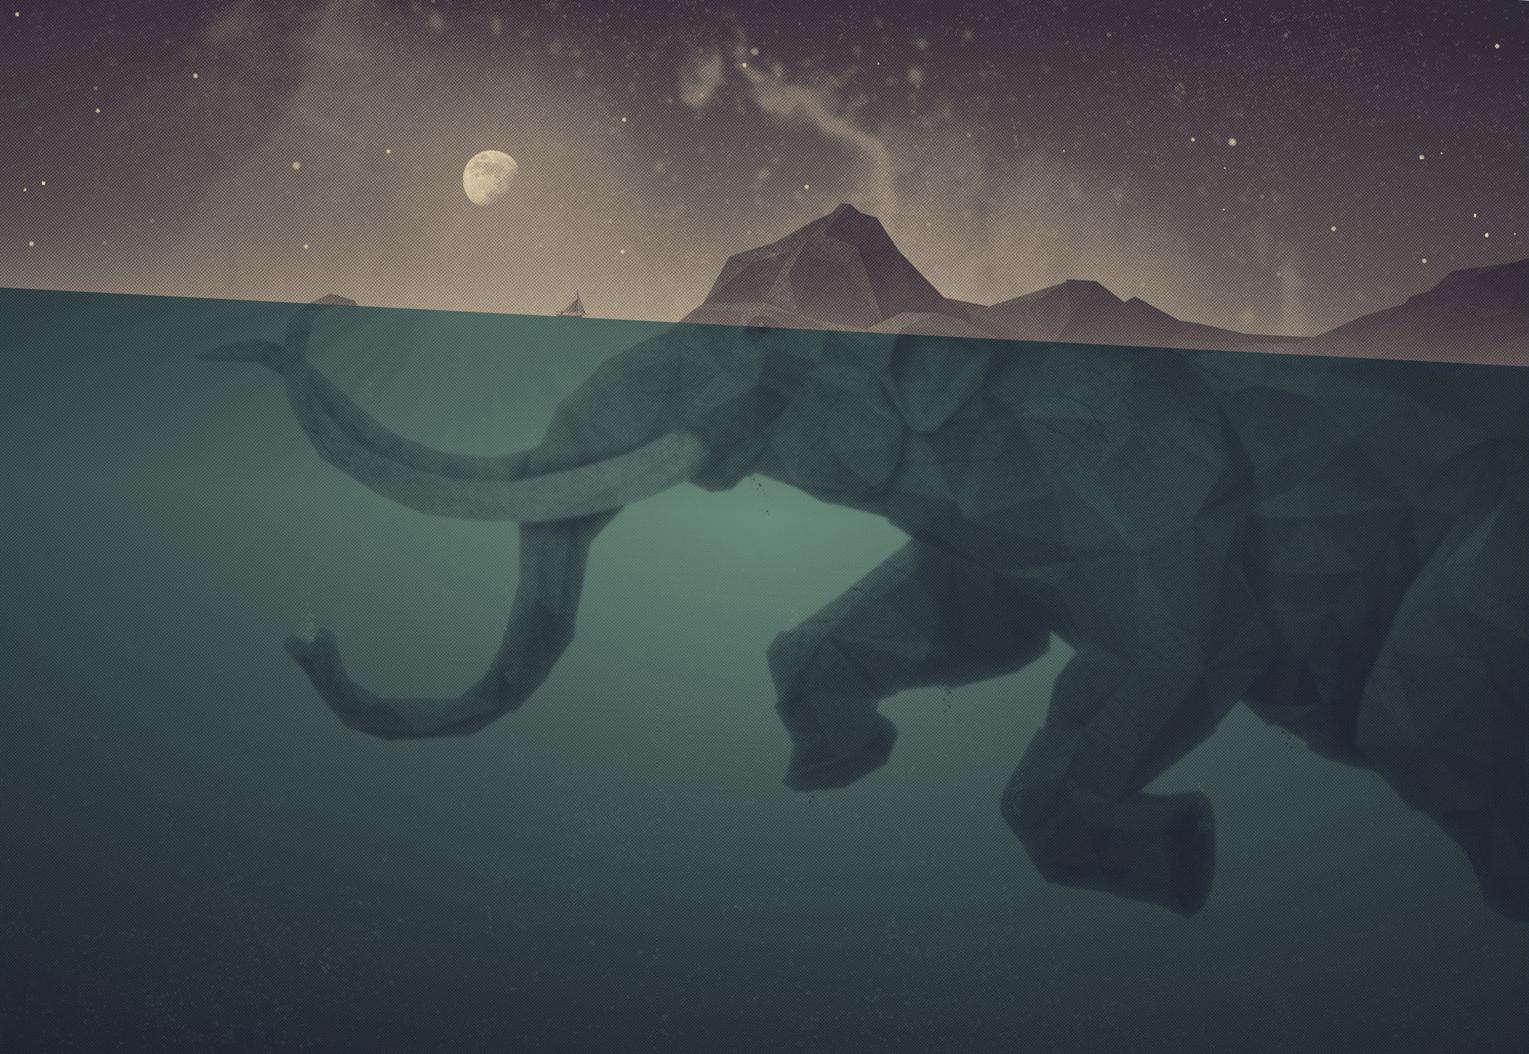 Indian Girl Wallpapers For Desktop Sketch Ocean Two Colors Rock Moon Artwork Elephants Surreal Art